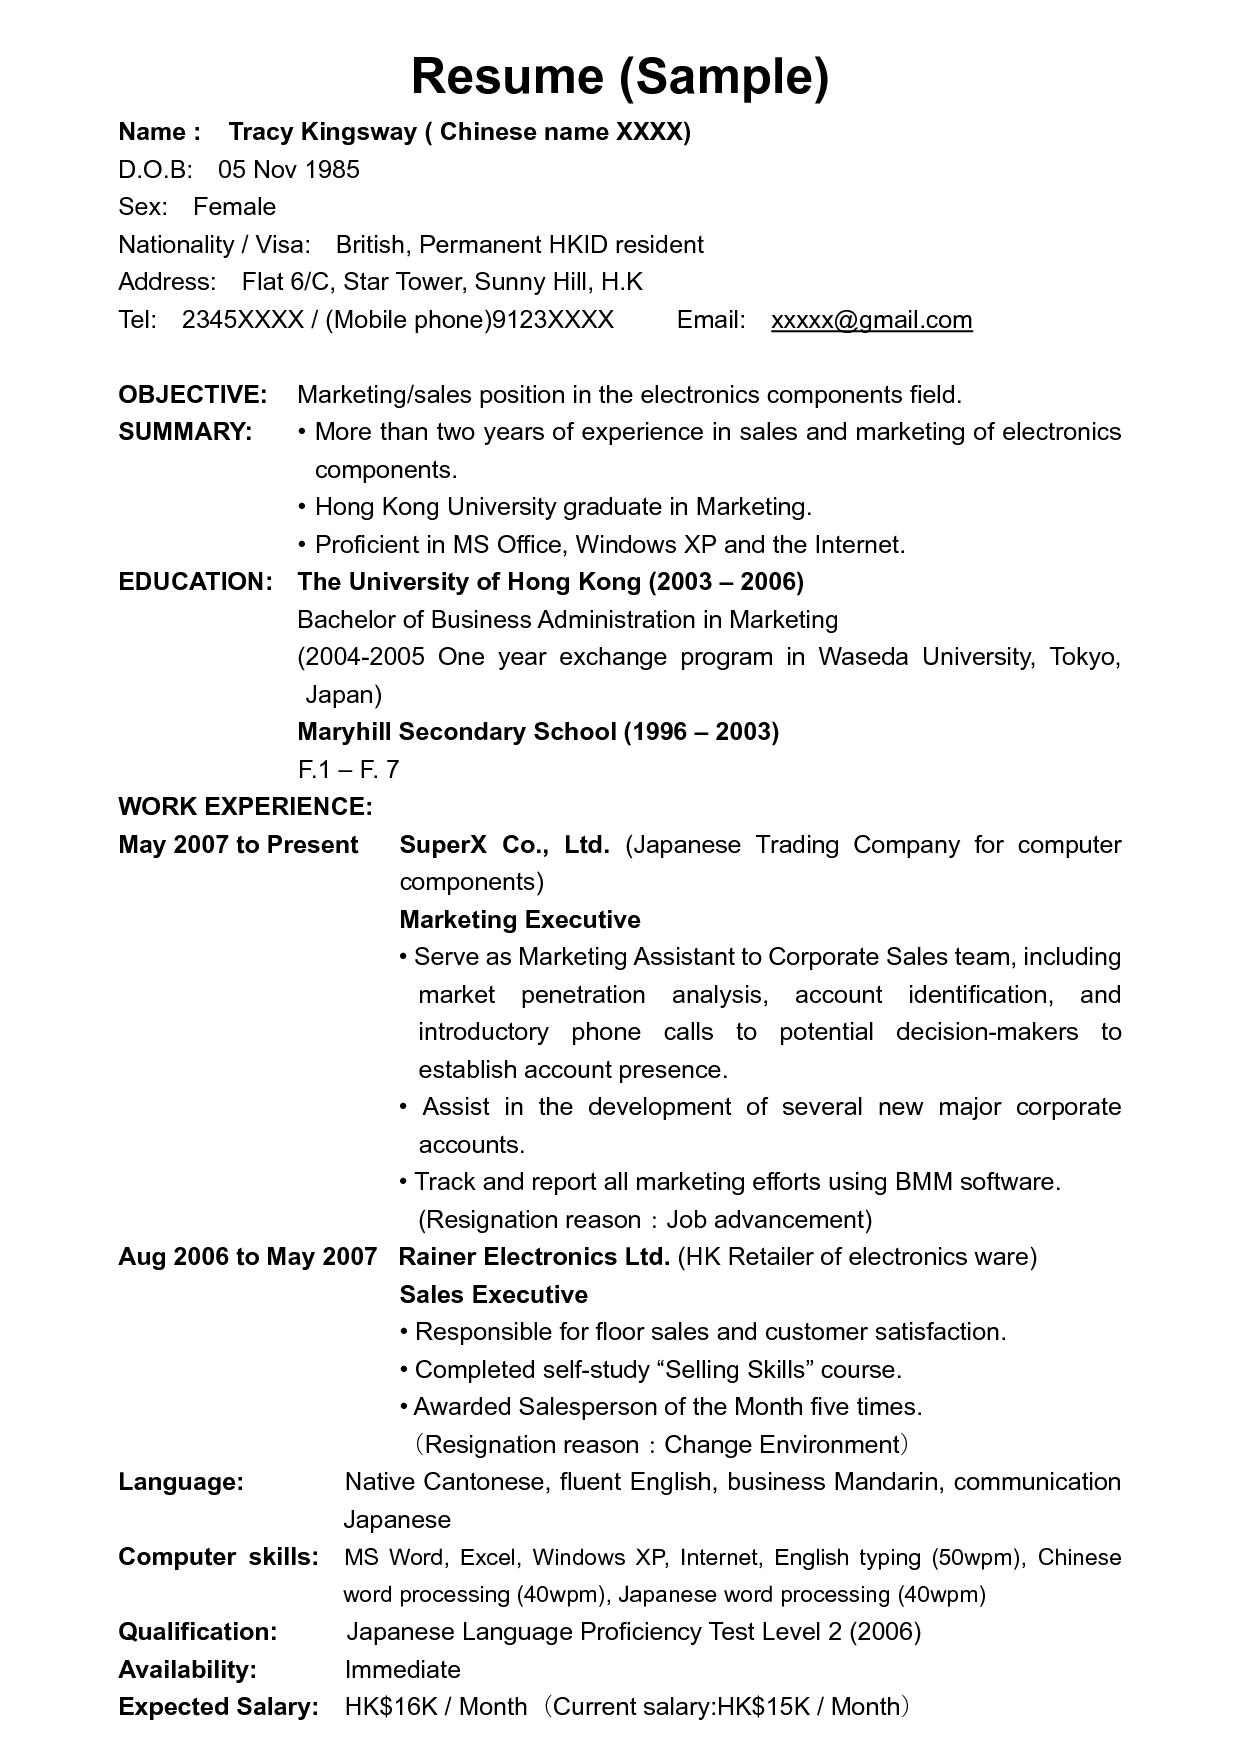 Resume format, Resume, Resume examples, Cover letter for